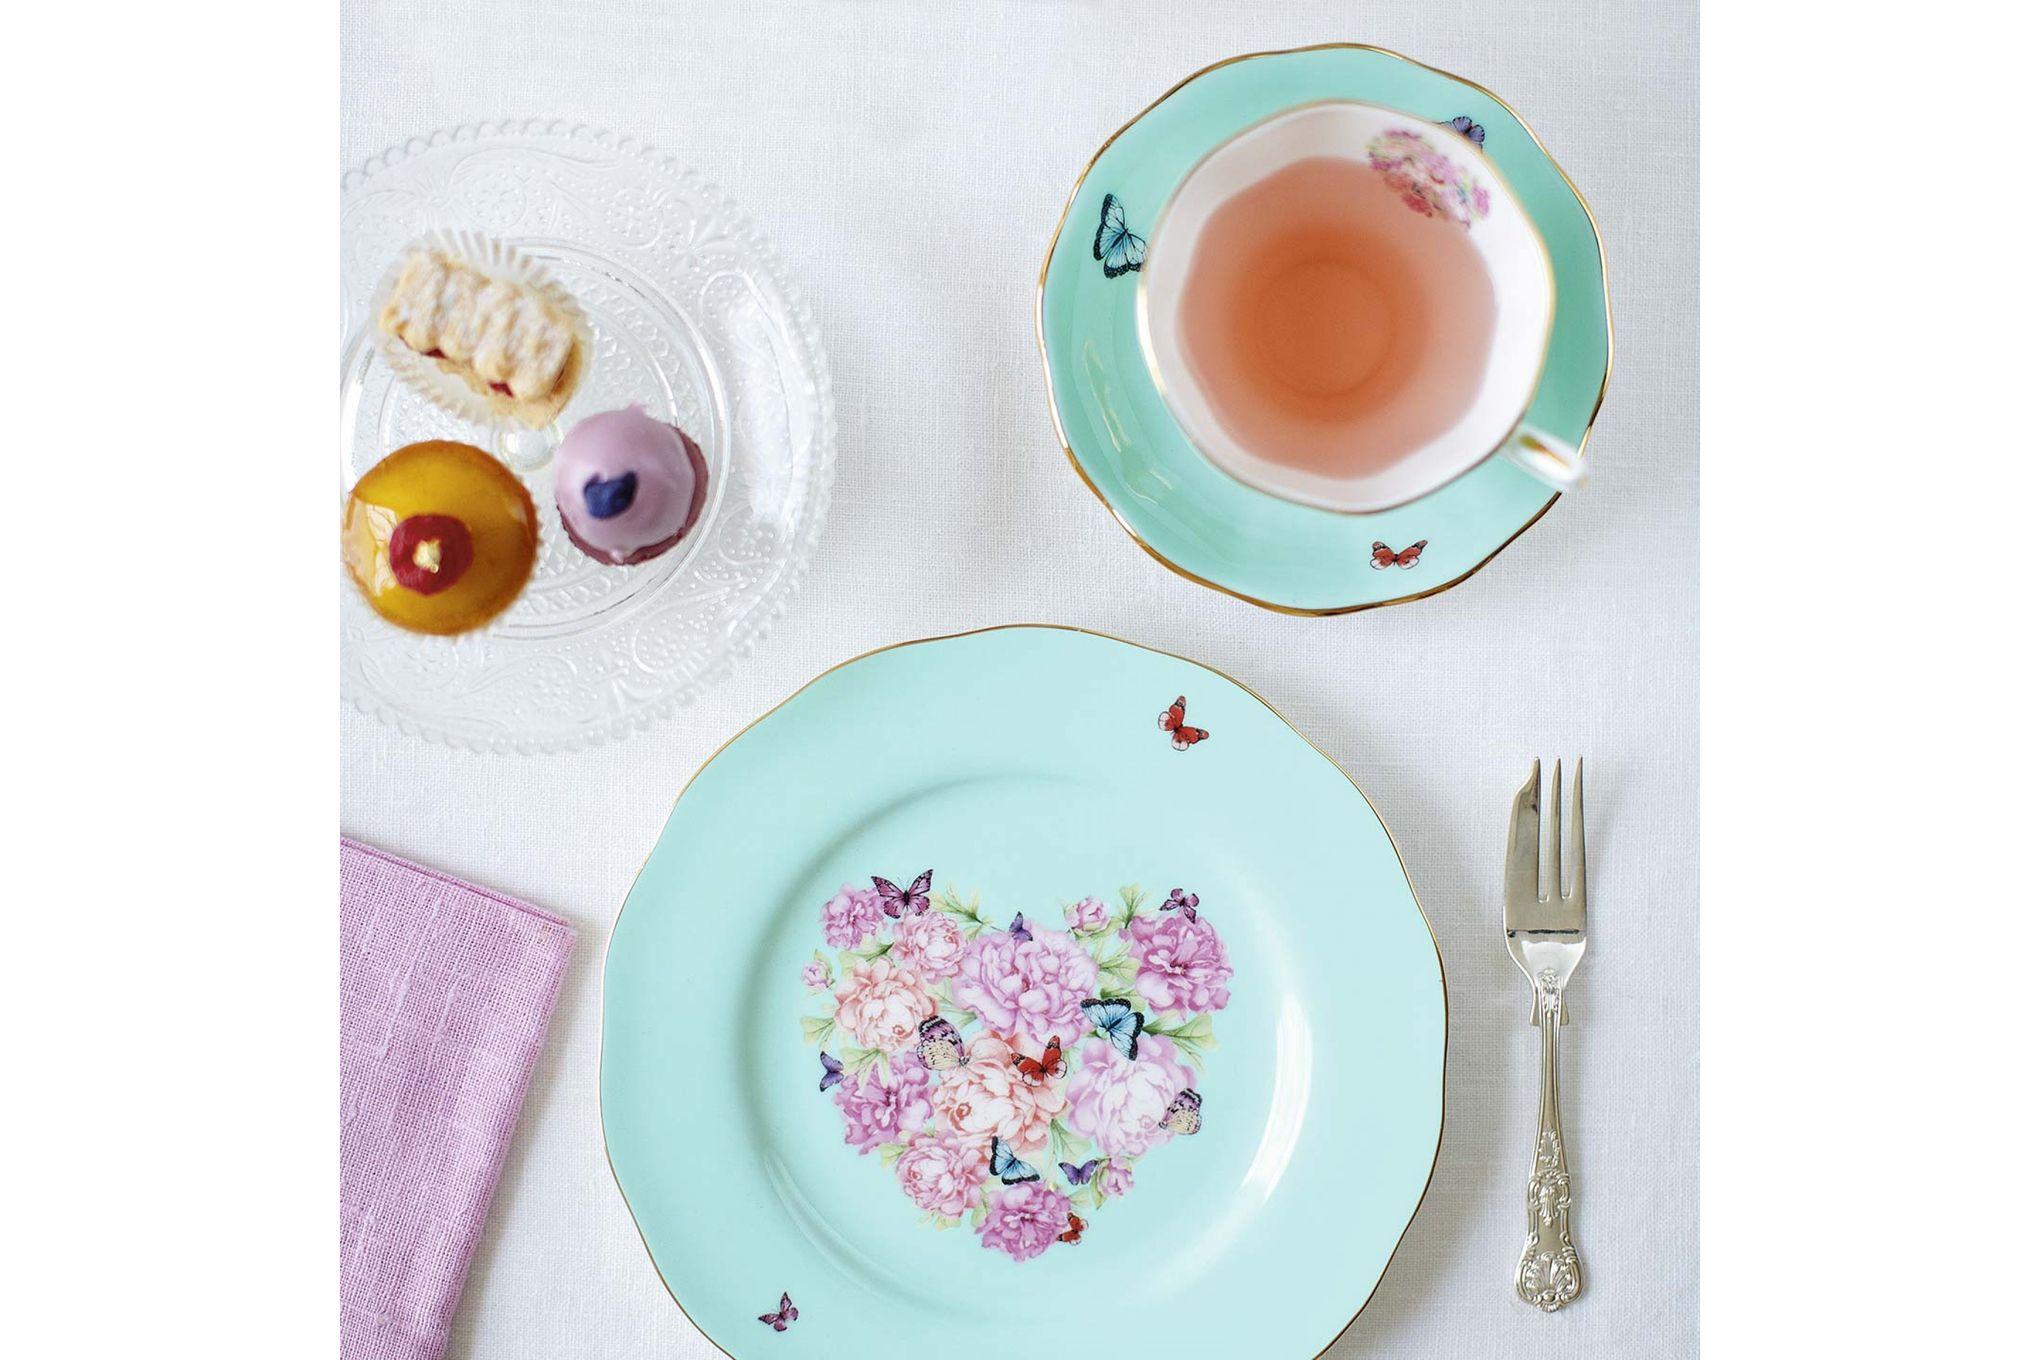 Miranda Kerr for Royal Albert Blessings 3 Piece Set Teacup, Saucer, Plate 20cm Blessings thumb 3